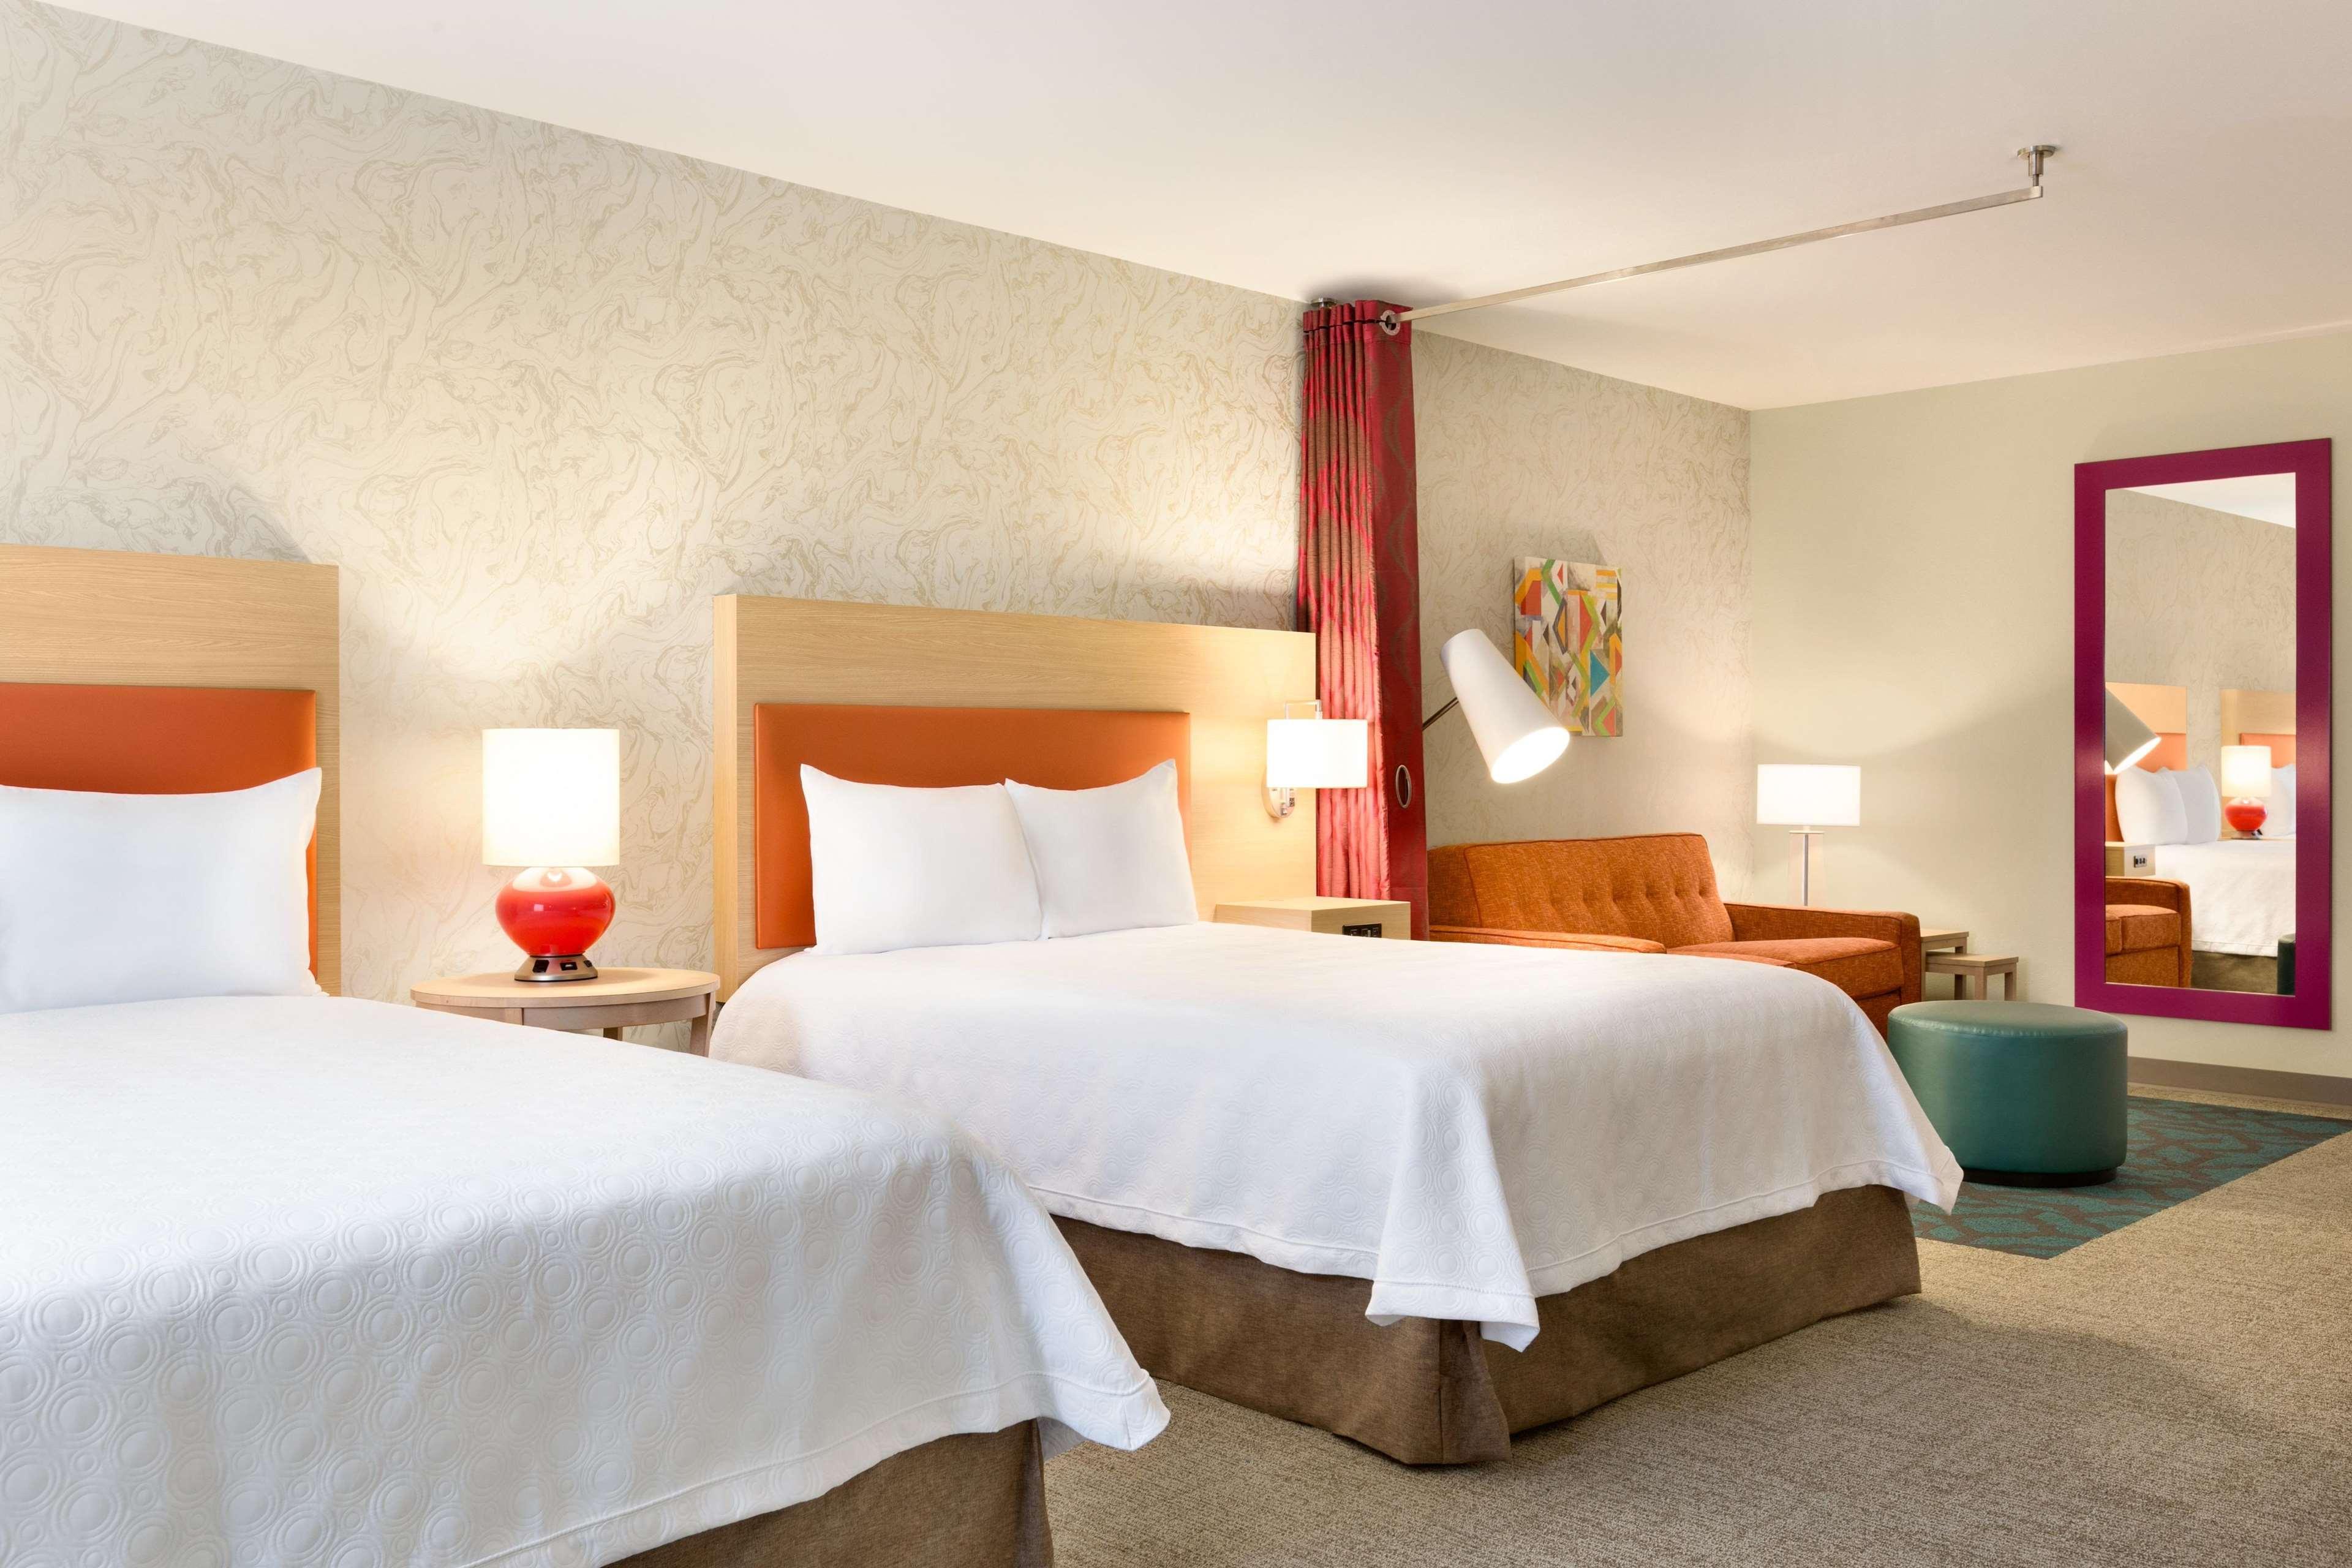 Home2 Suites by Hilton Florence Cincinnati Airport South image 28